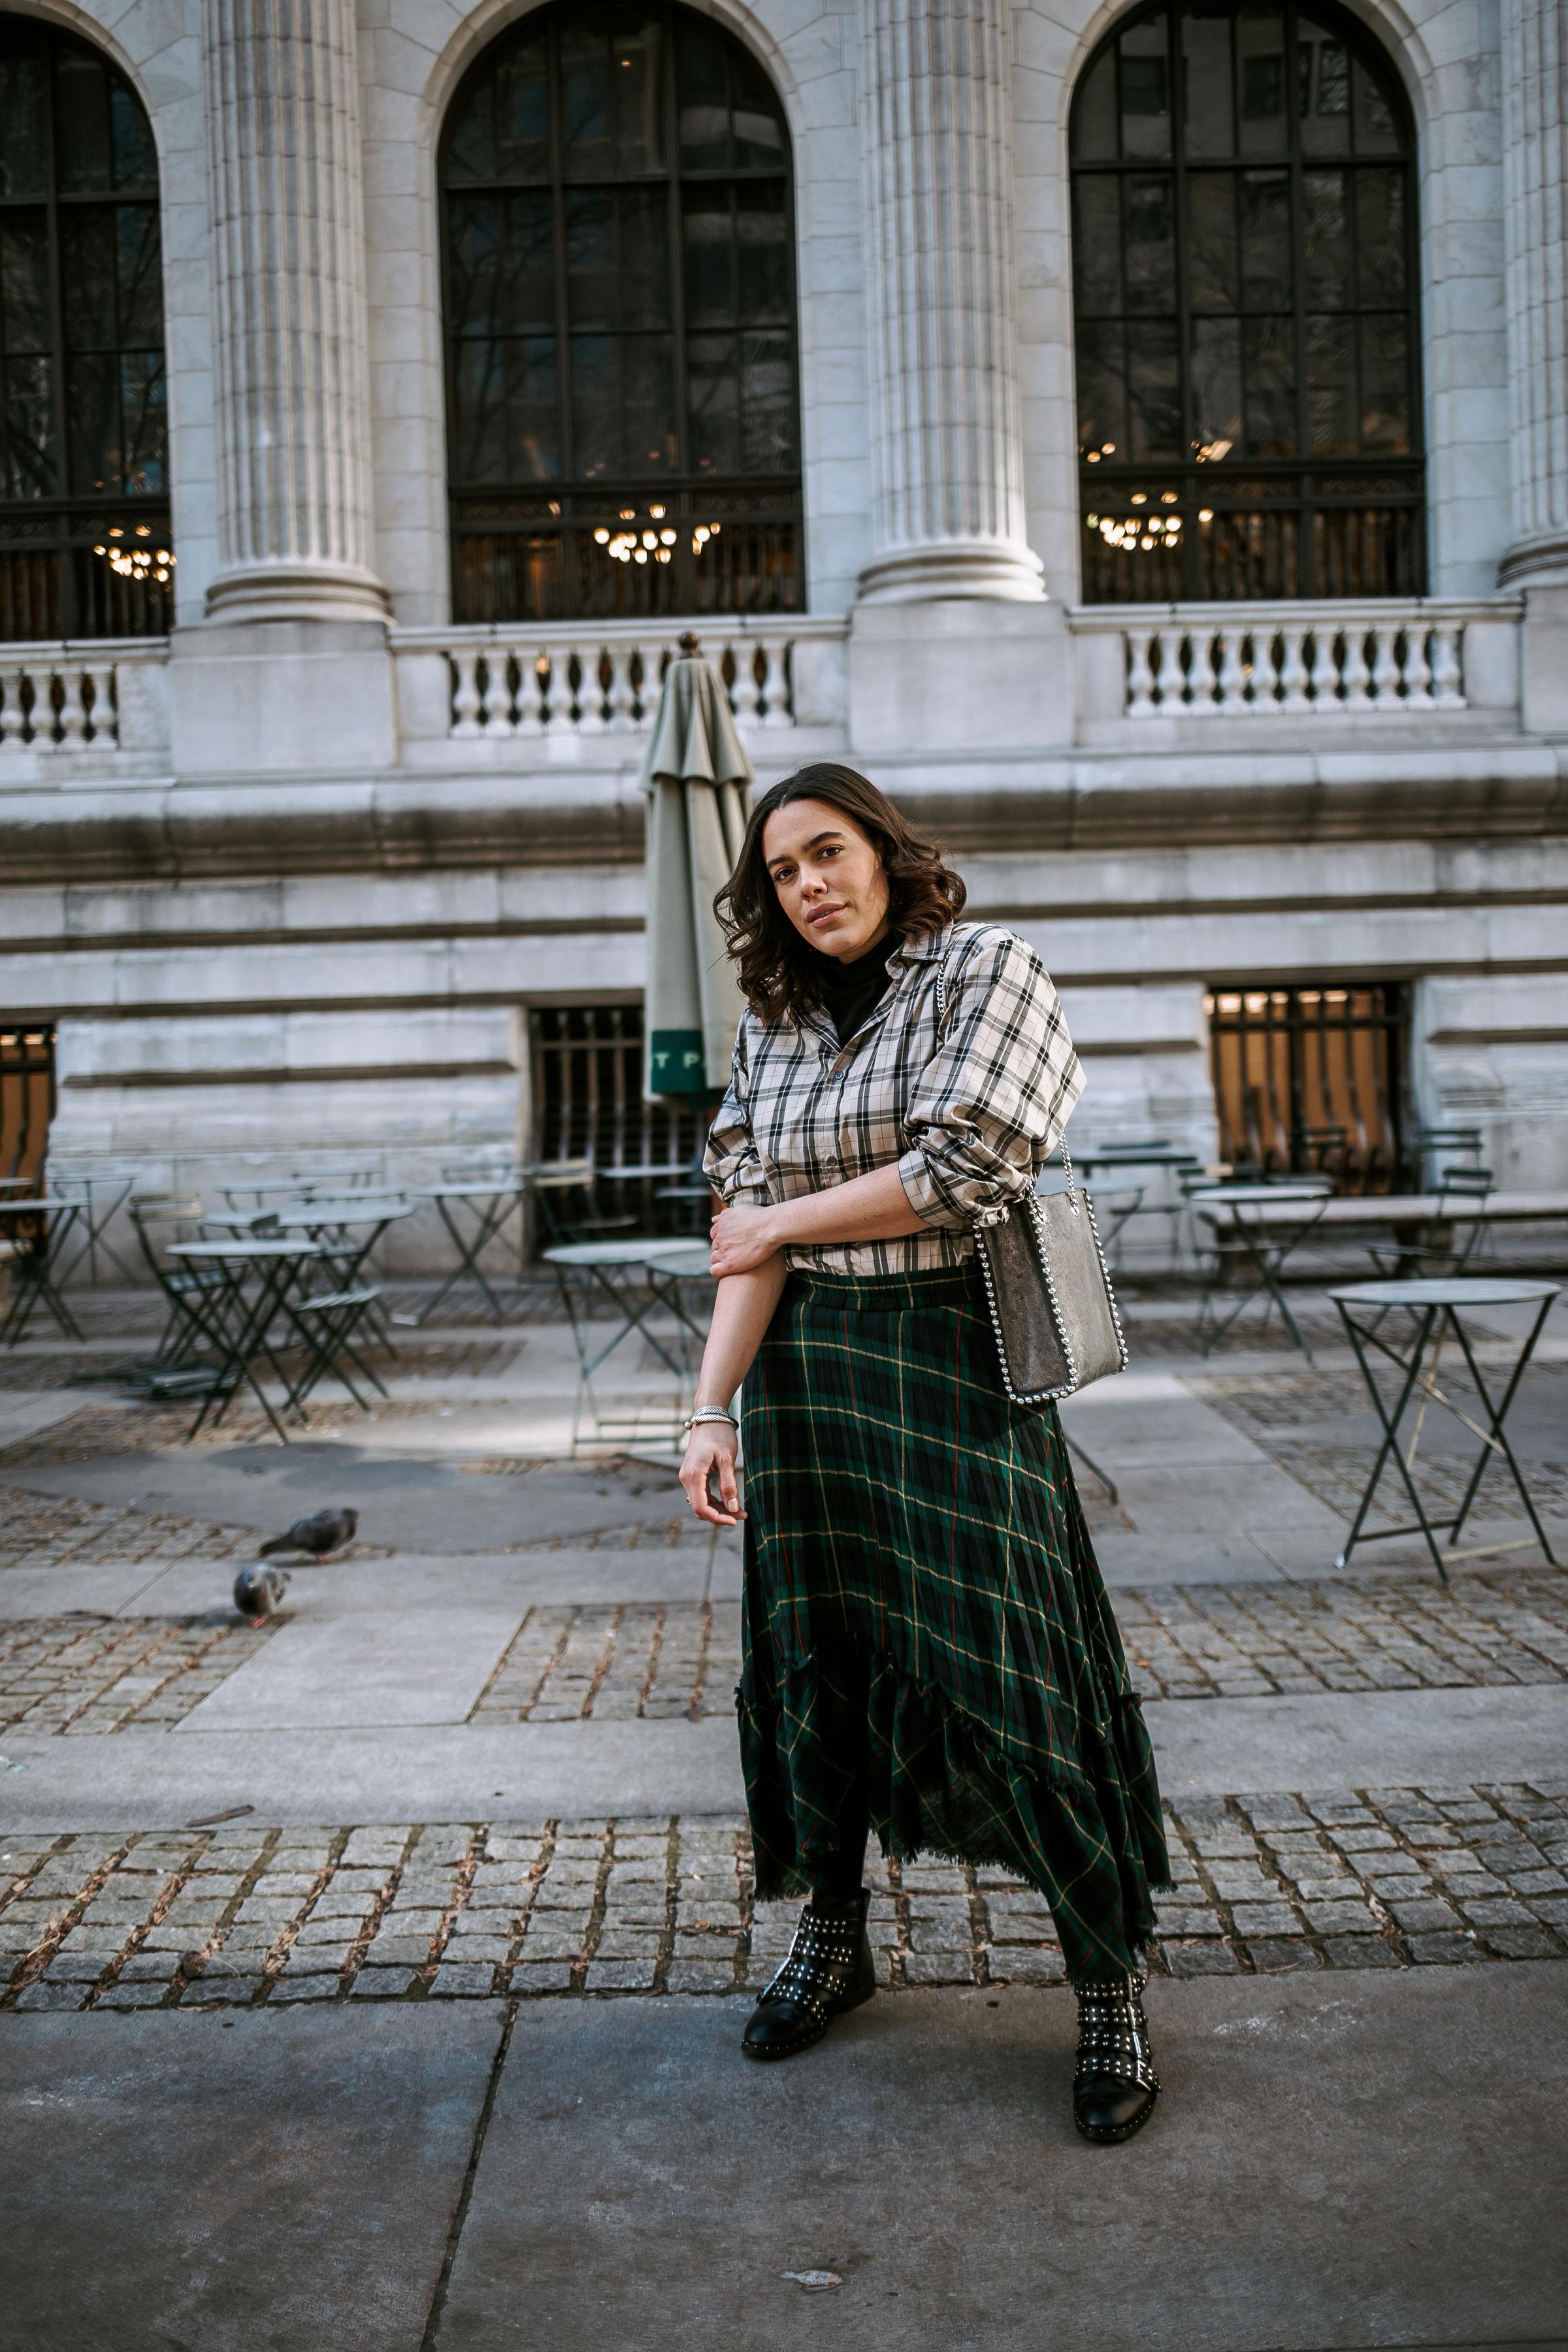 how-to-style-plaid-on-plaid-zara-plaid-skirt-studded-boots-givenchy-dupe-latina-new-york-city-fashion-blogger-style-operator-winter-fashion.jpg